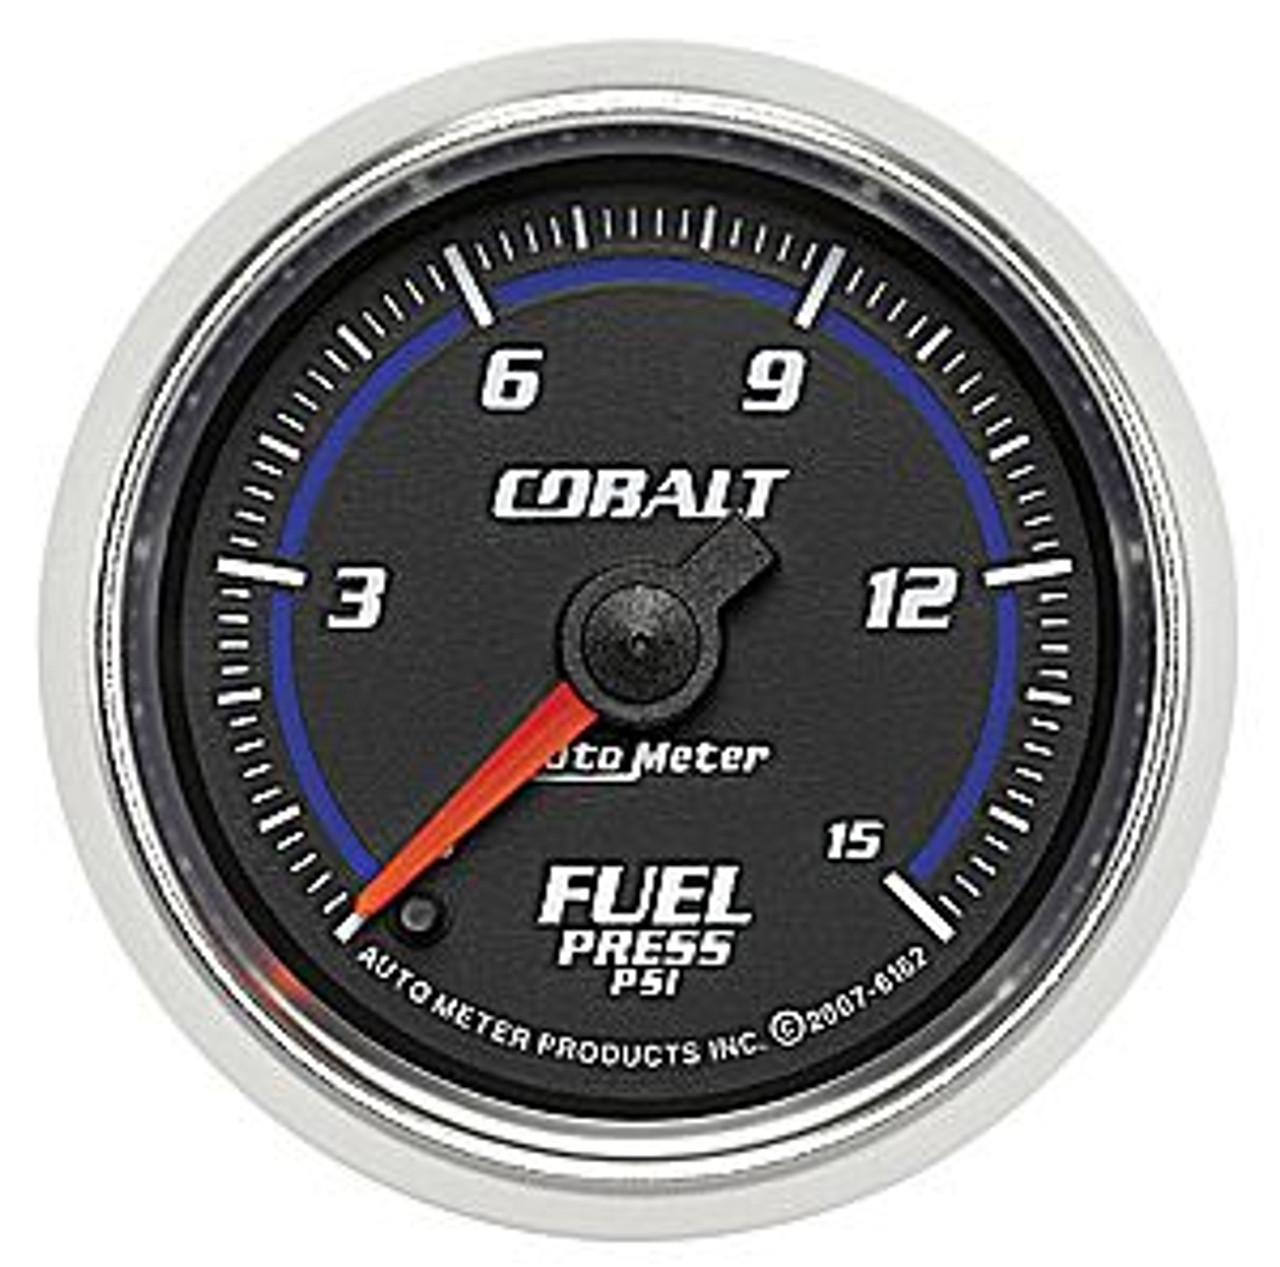 Autometer 2-1/16 In., Full Sweep, Fuel Press, 0-15 Psi, Cobalt